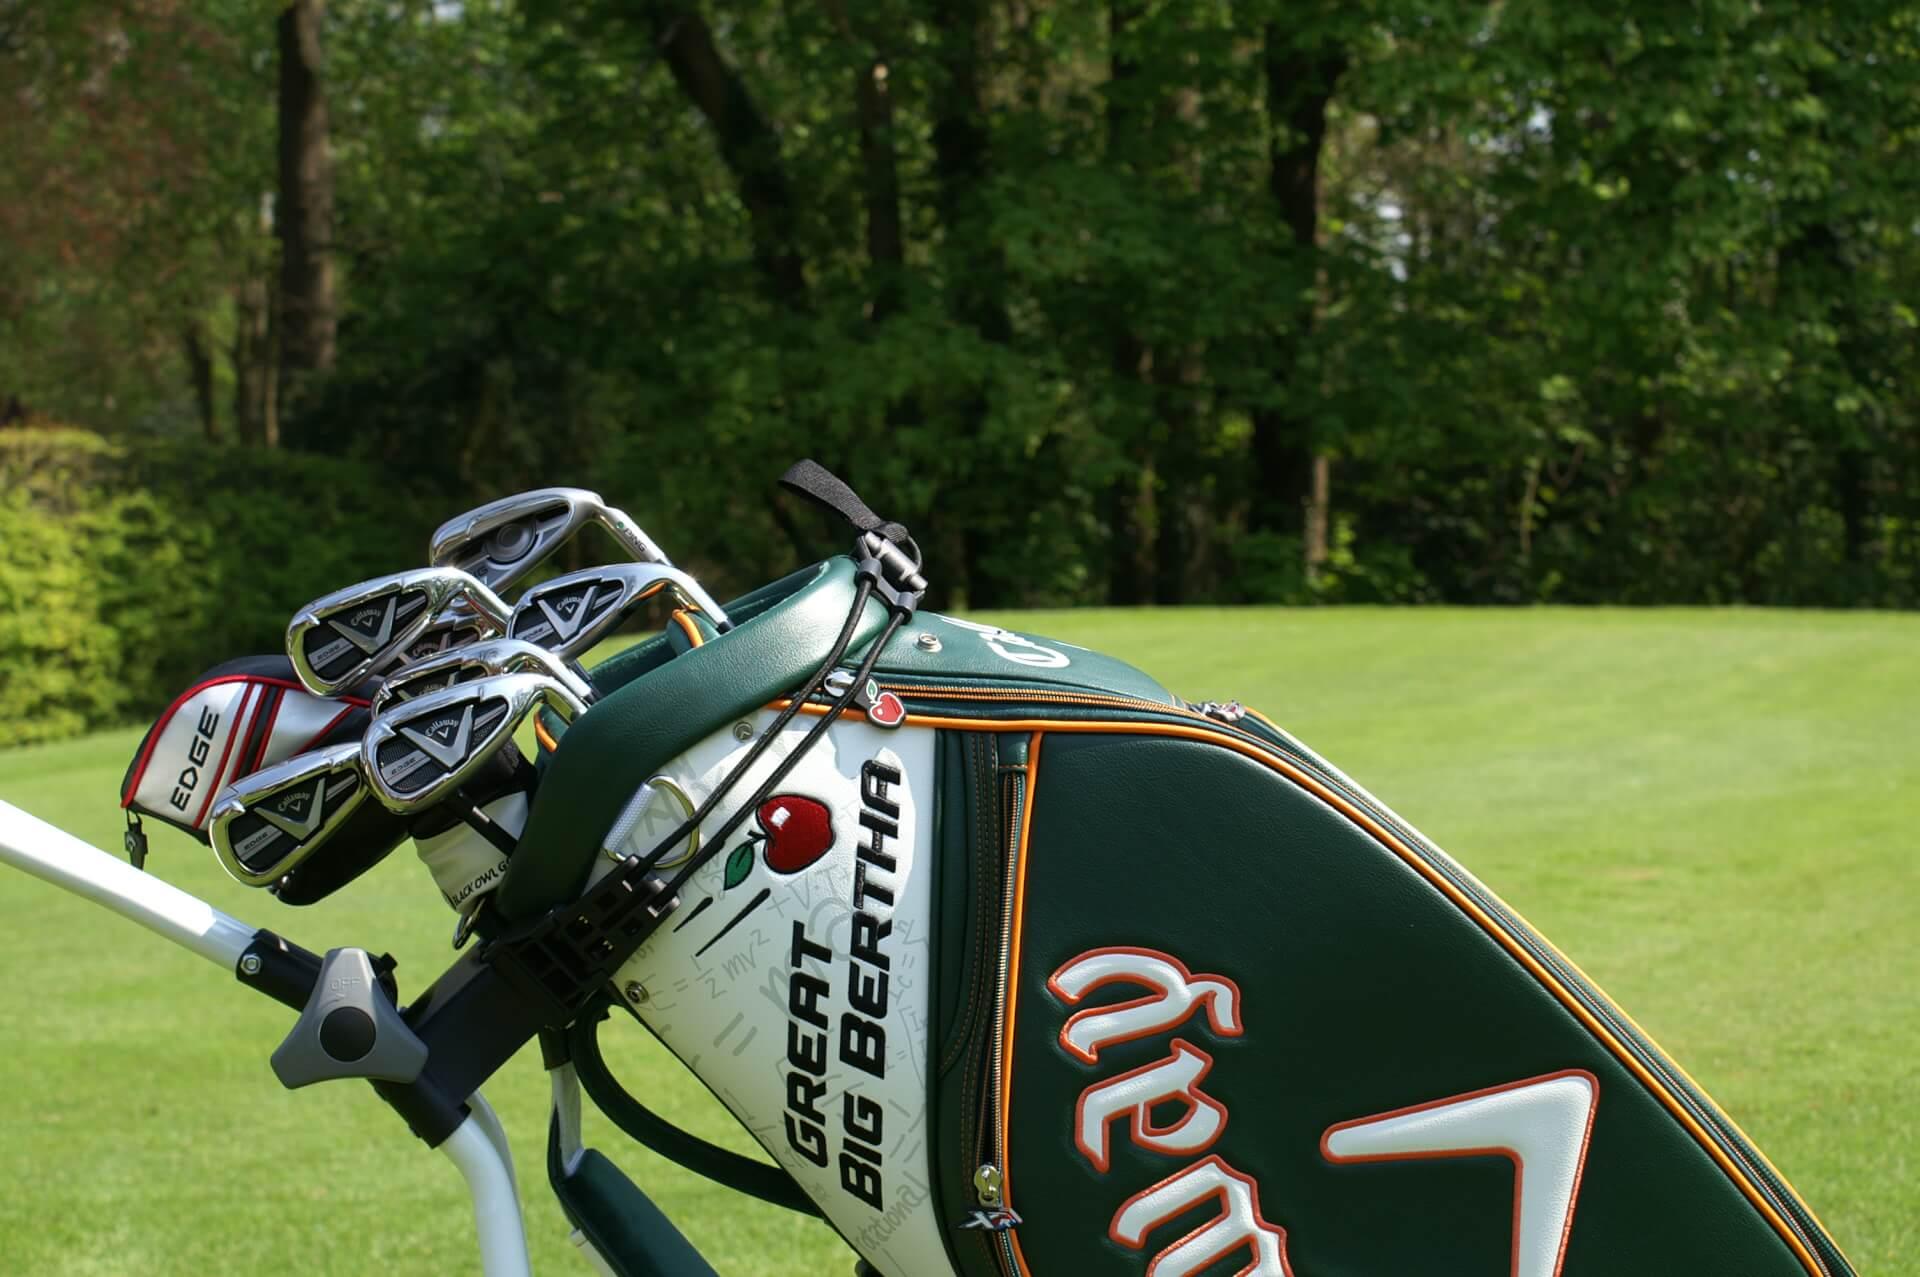 https://golfclub-peckeloh.de/wp-content/uploads/2018/02/PICT0055-2.jpg